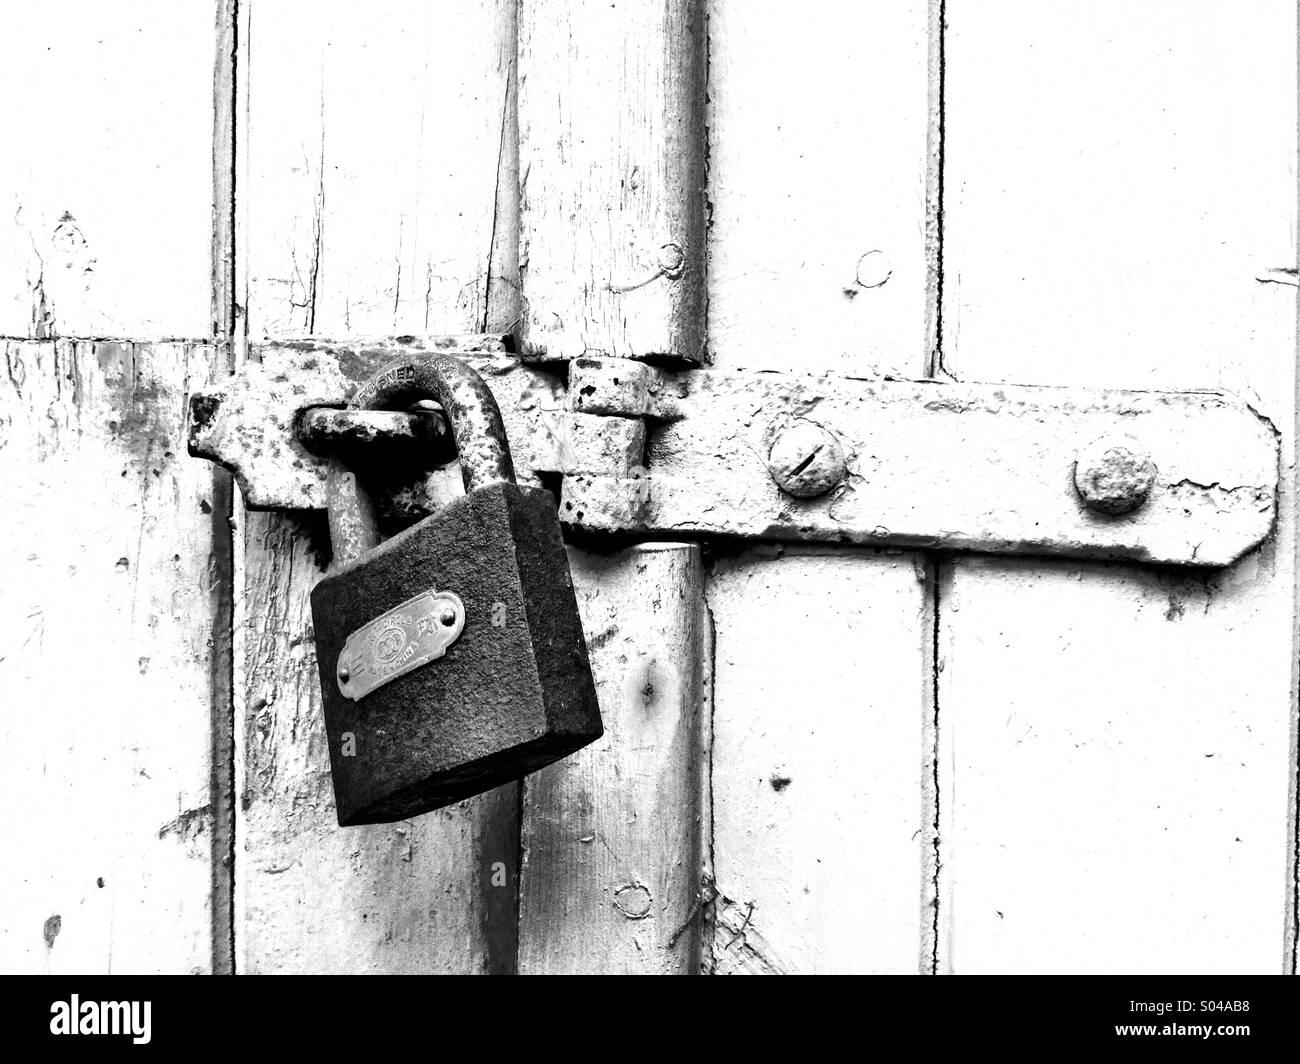 Locked - Stock Image